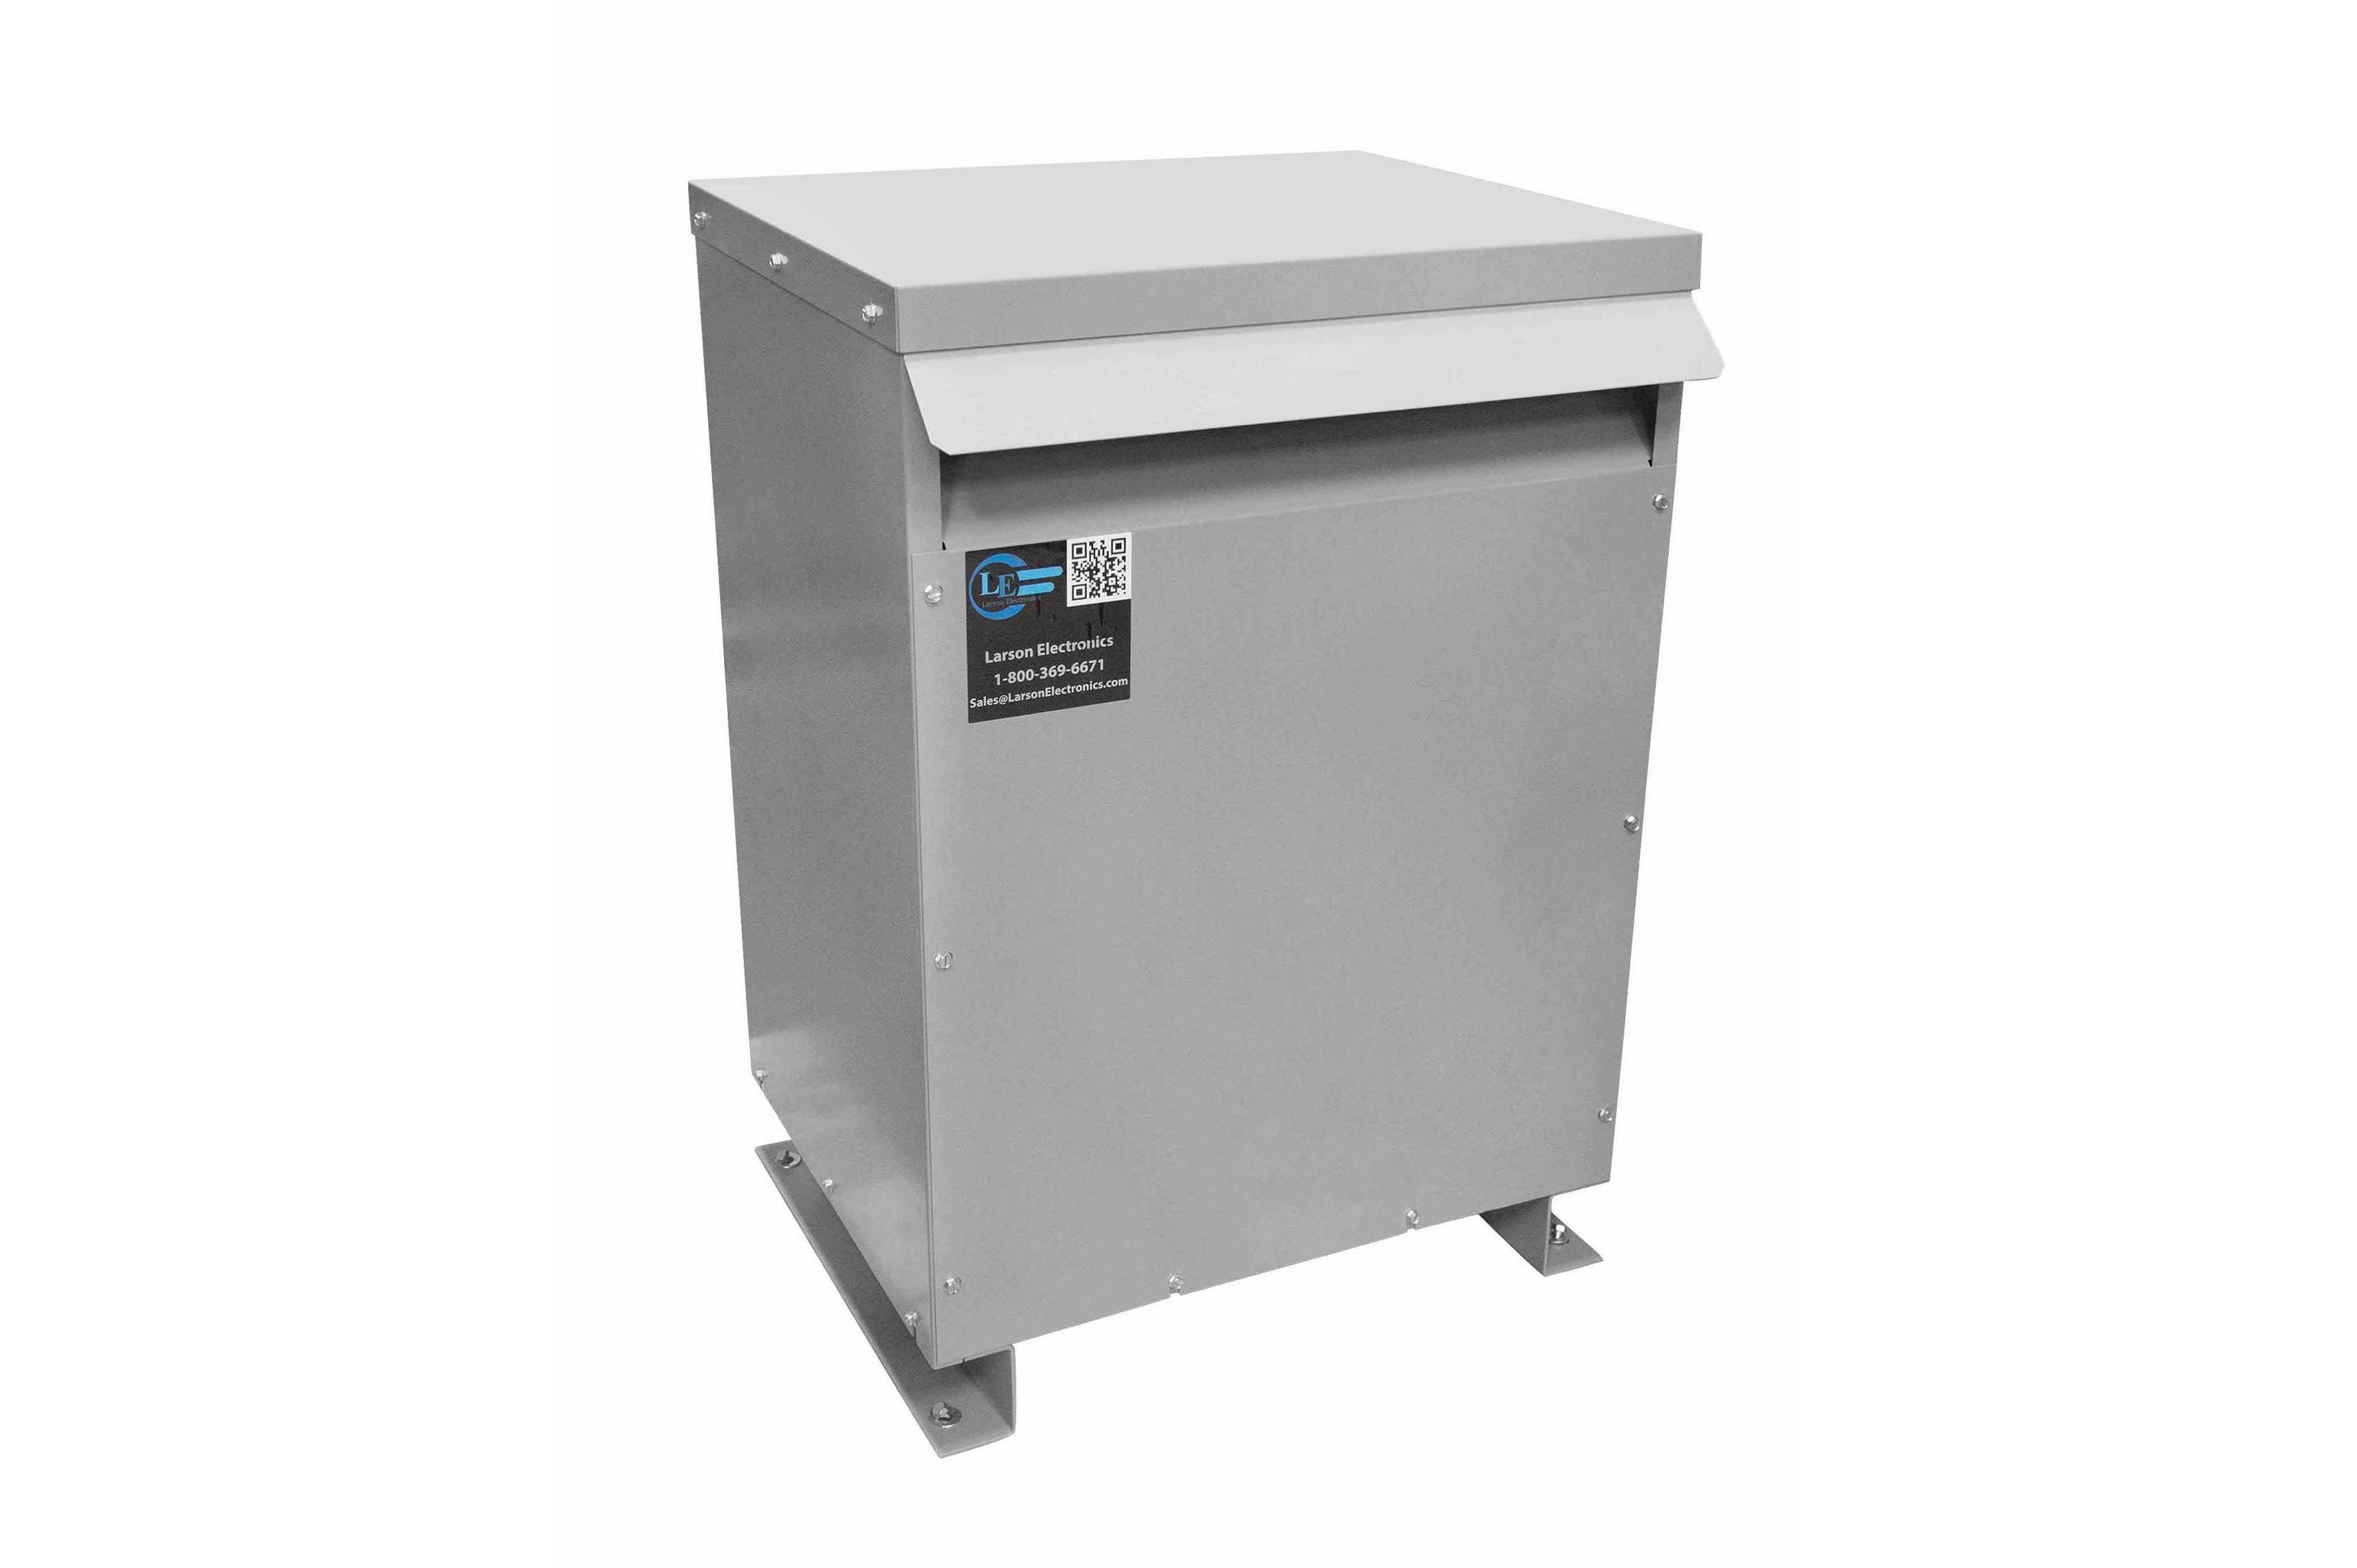 750 kVA 3PH DOE Transformer, 240V Delta Primary, 208Y/120 Wye-N Secondary, N3R, Ventilated, 60 Hz